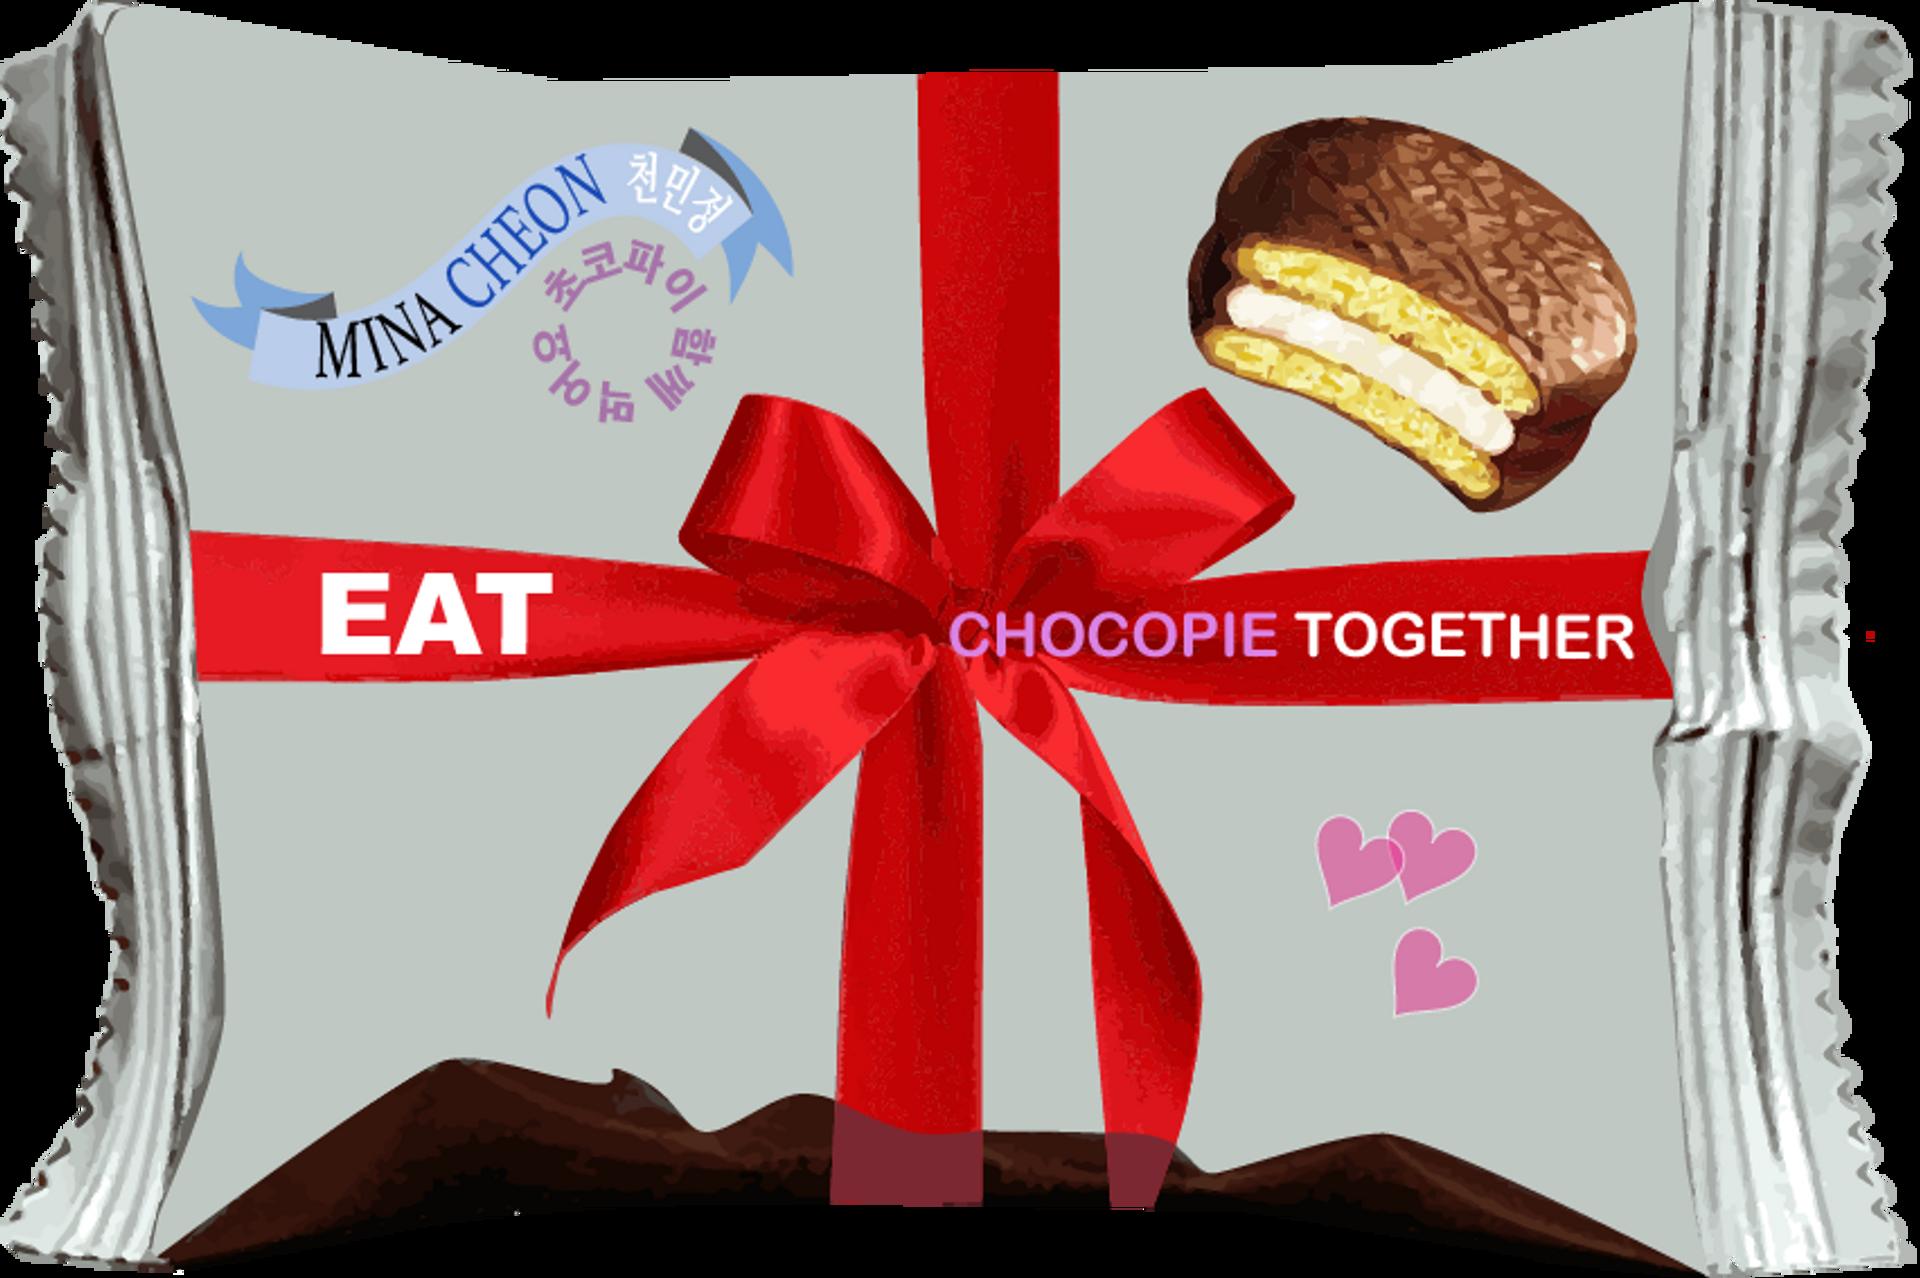 Mina Cheon, Eat Chocopie Together (2020)